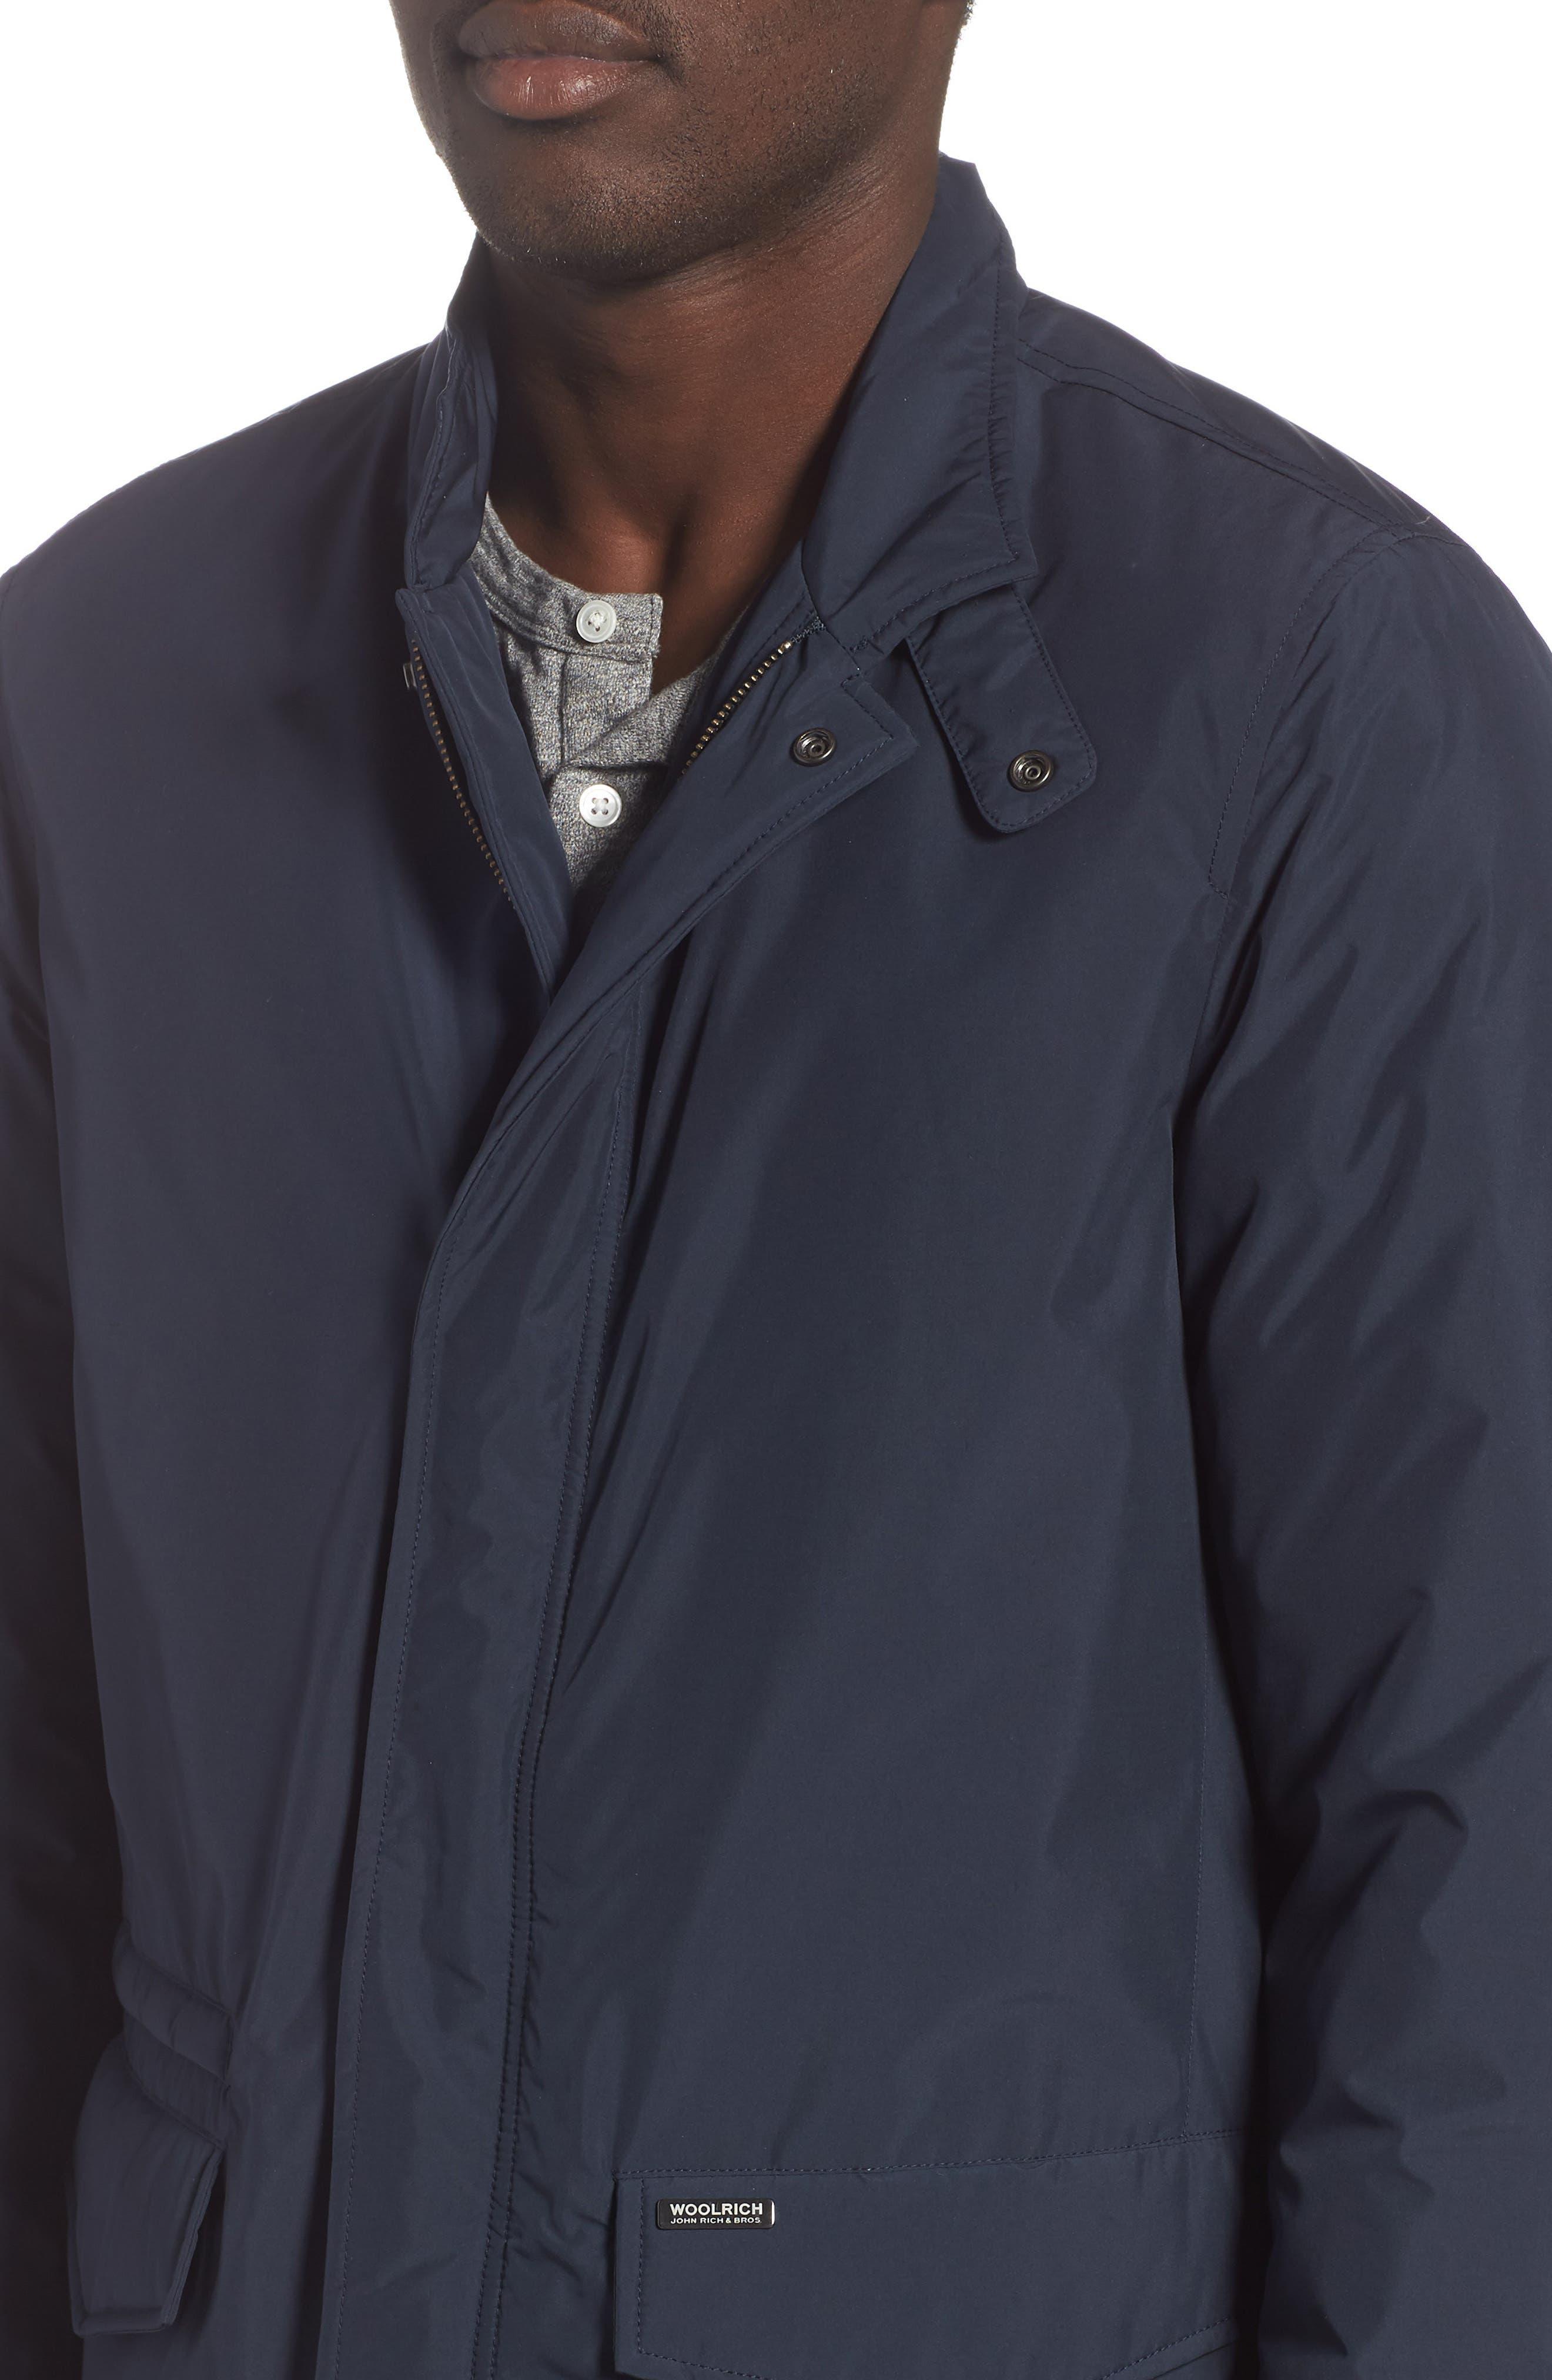 City Down Jacket,                             Alternate thumbnail 4, color,                             MELTON BLUE